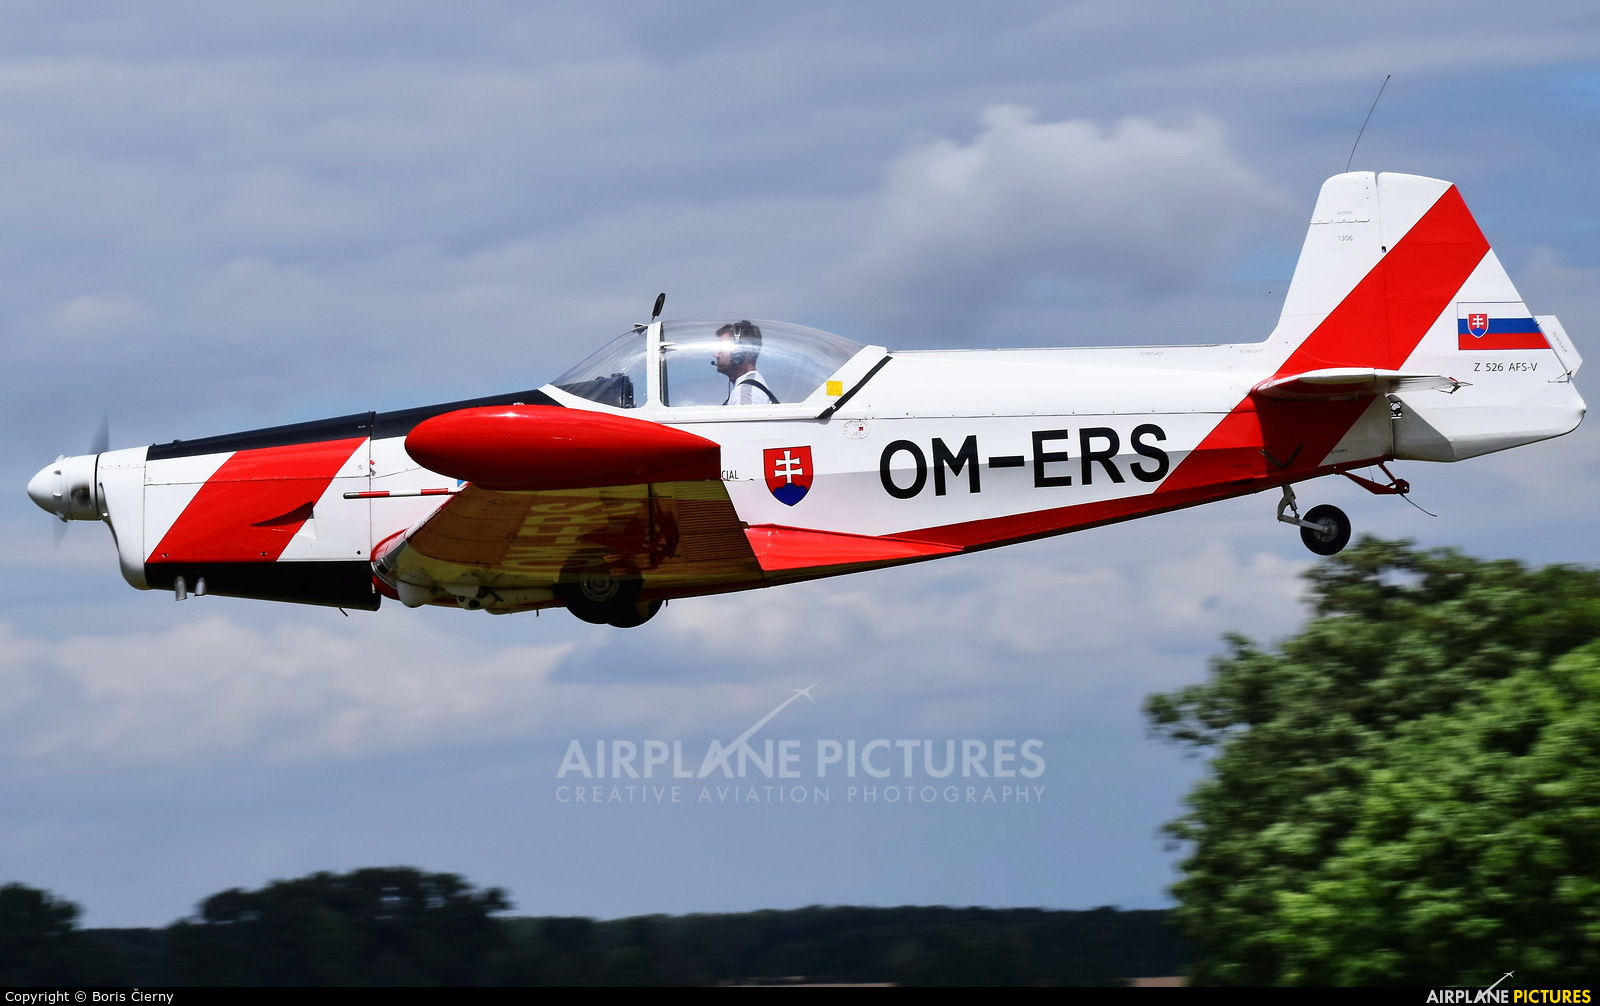 Aeroklub Bratislava OM-ERS aircraft at Trnava- Boleráz